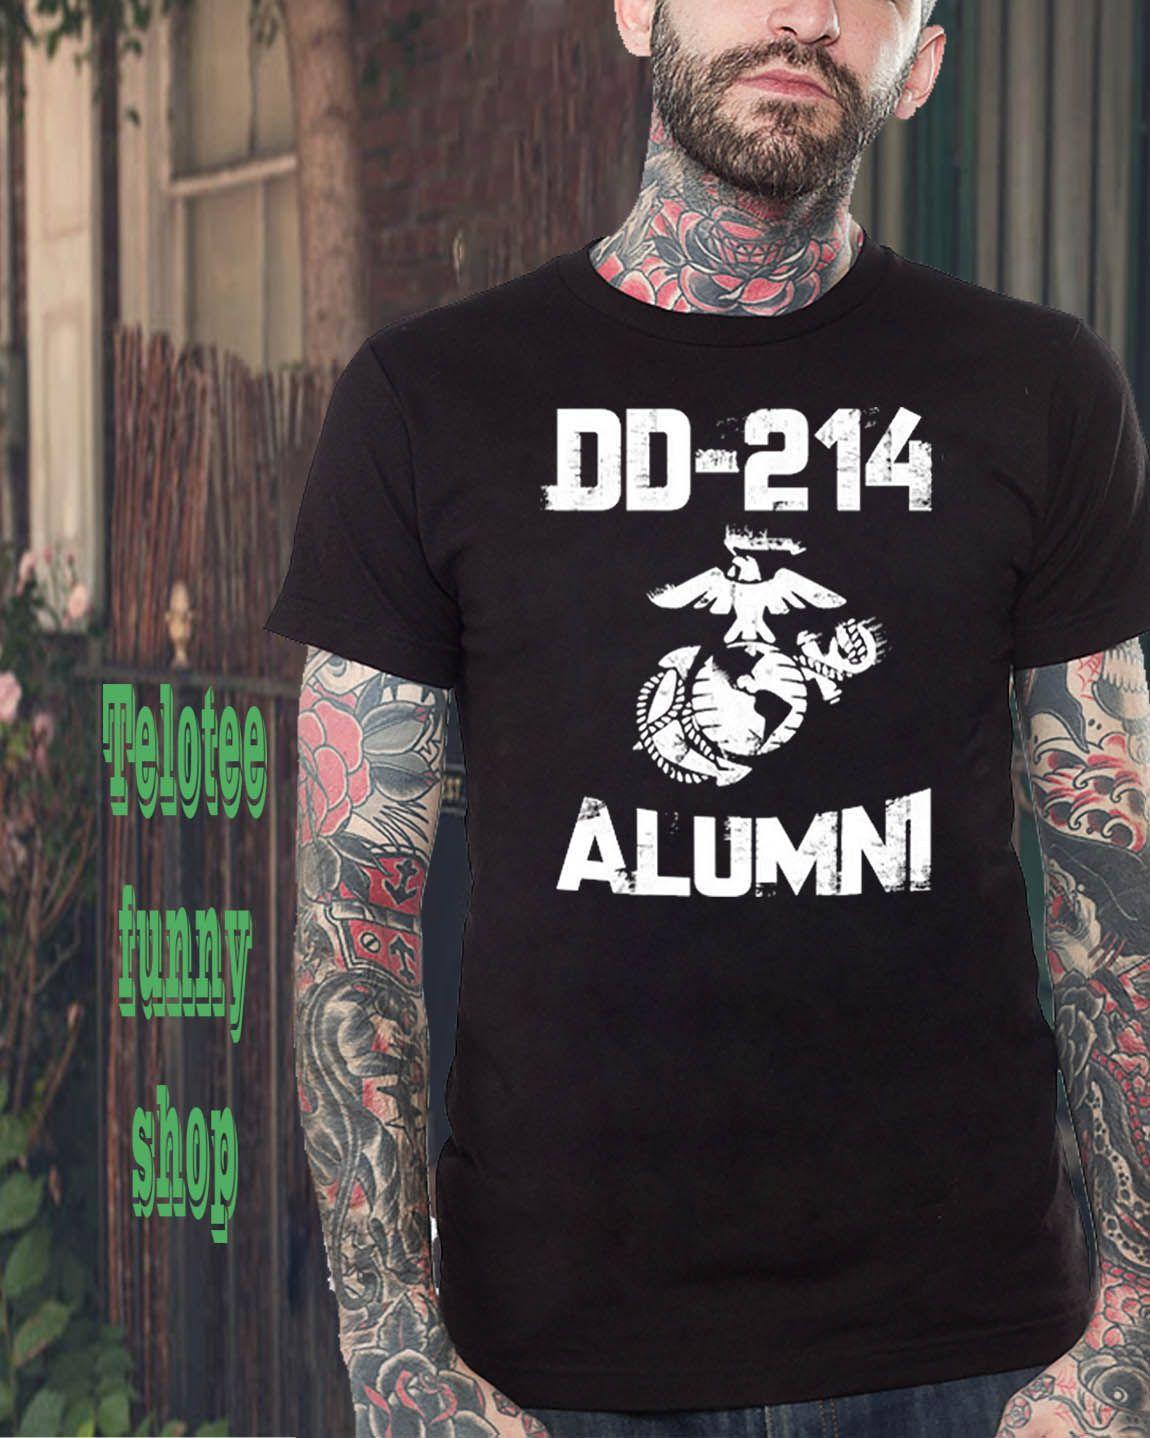 U.s marine DD214 alumni shirt, Hoodie, Vneck, Sweater